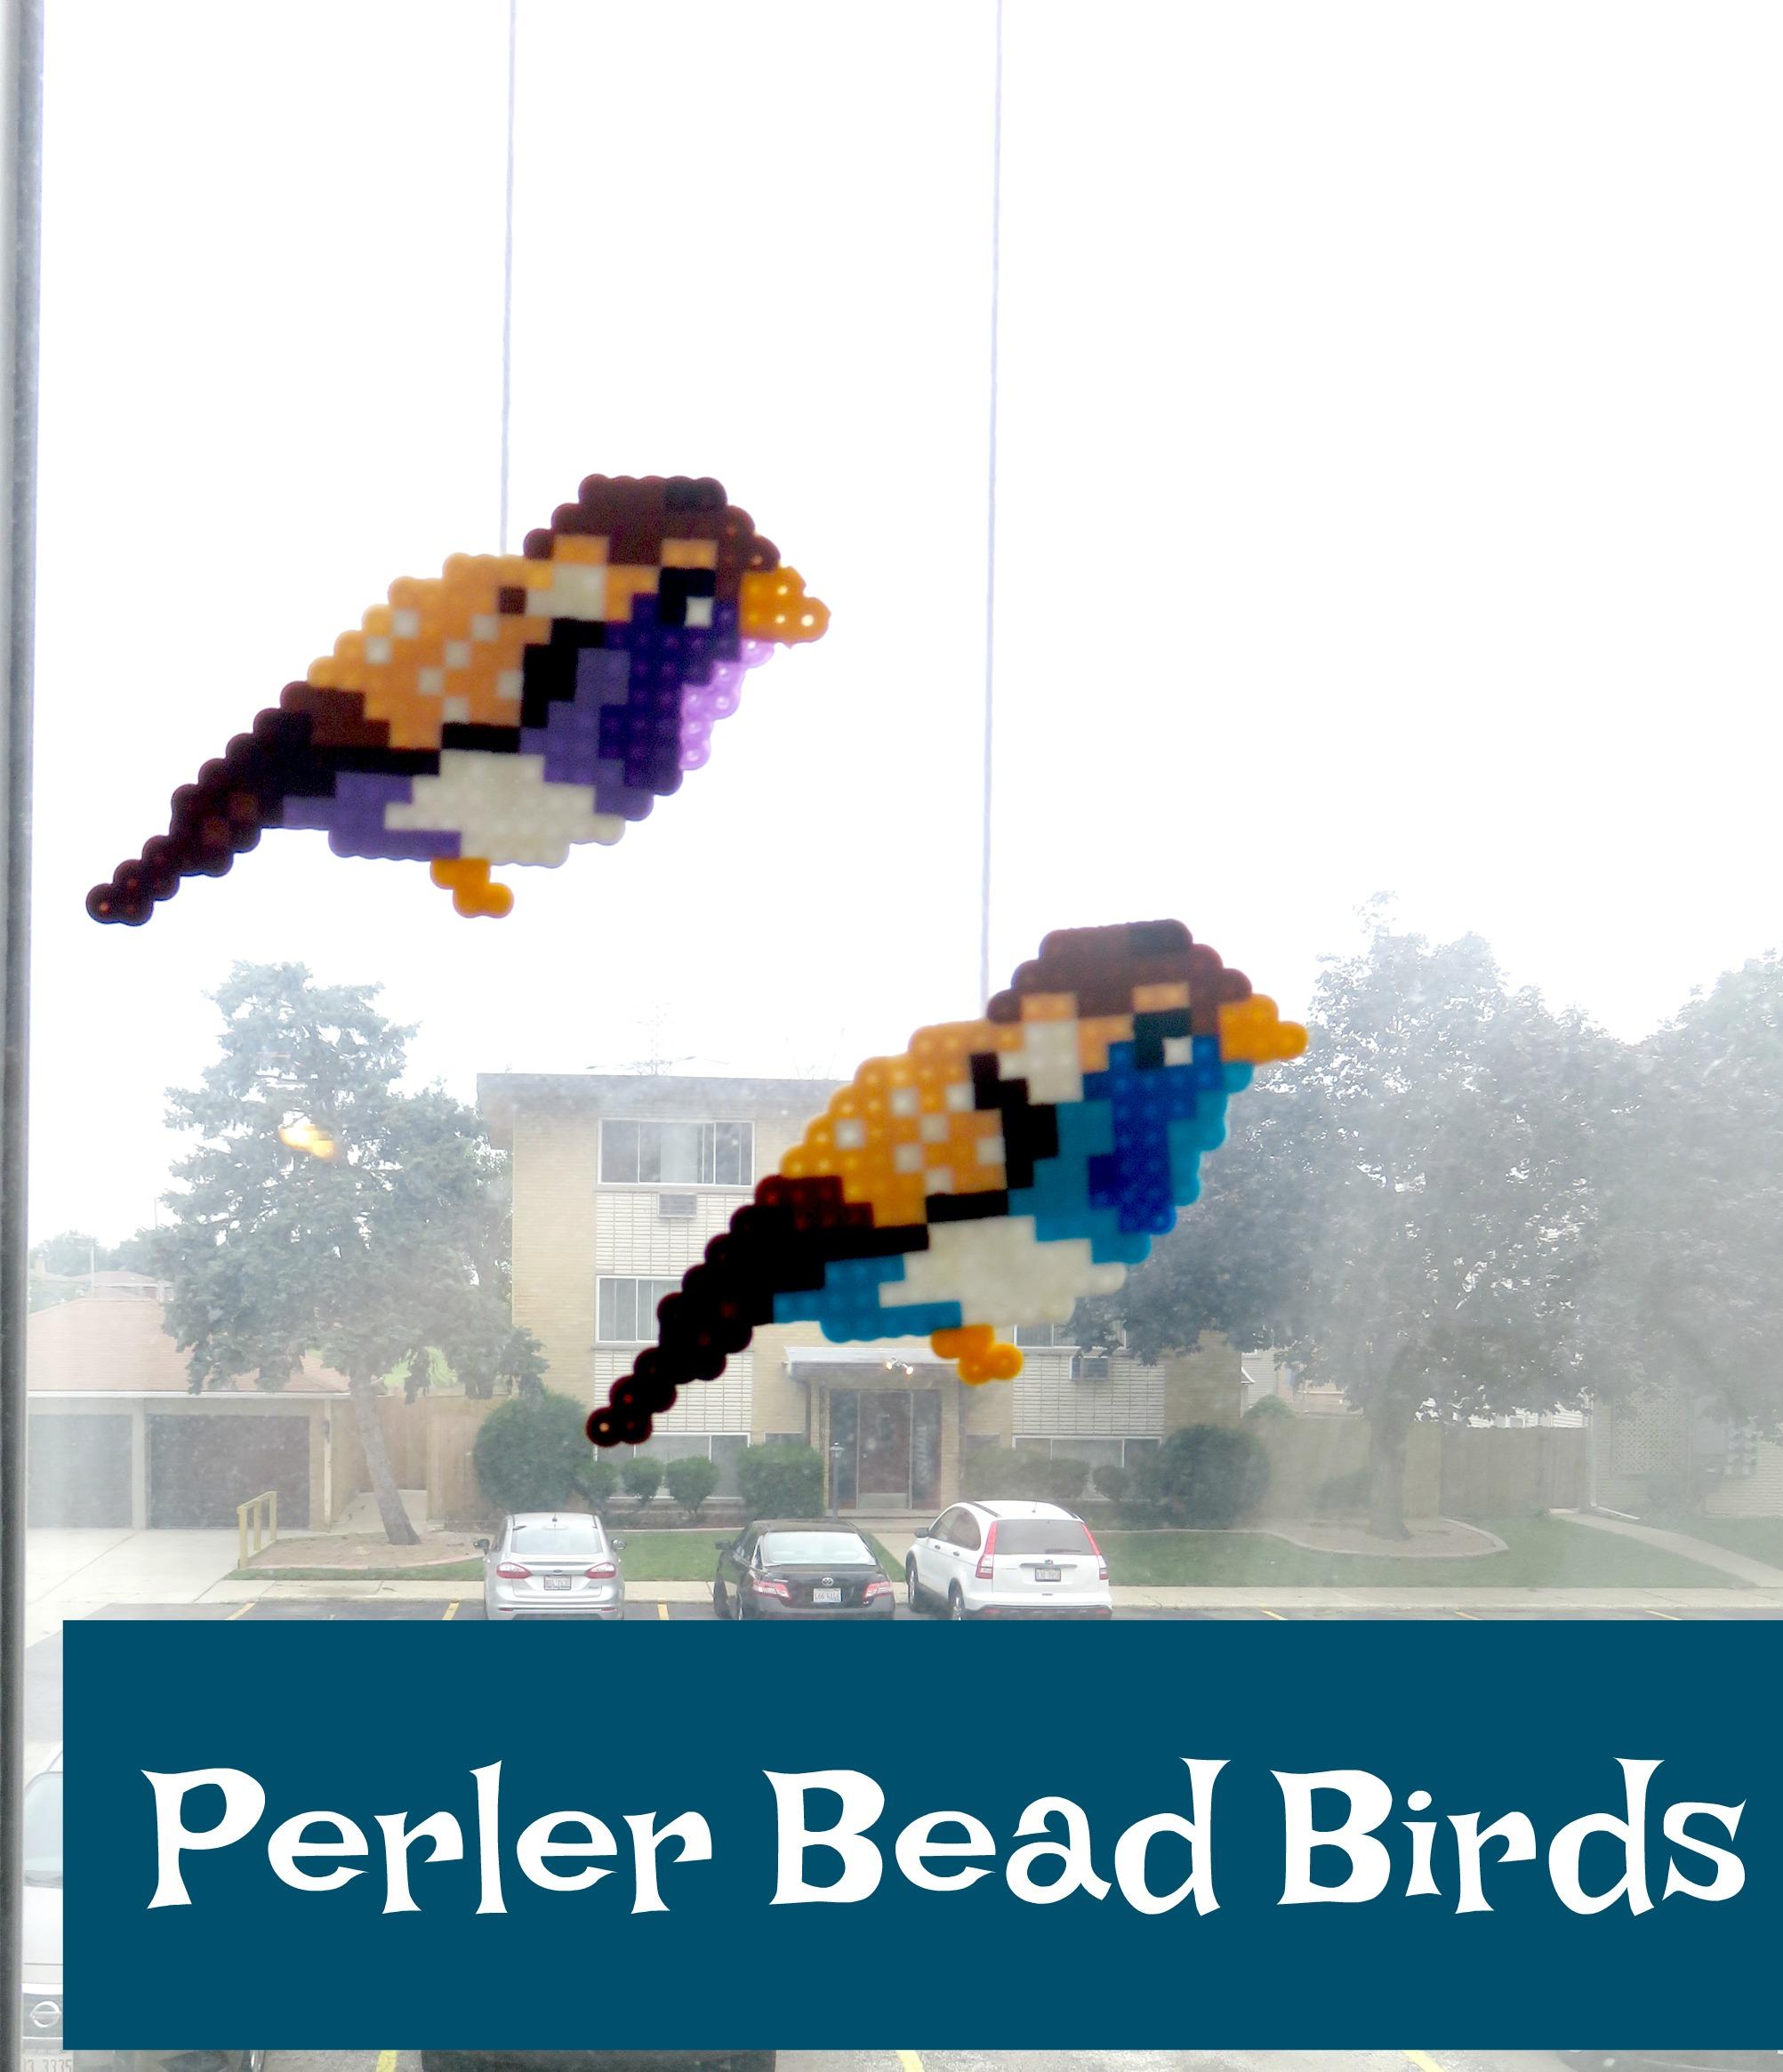 Perler Bead Birds | The Hob-bee Hive